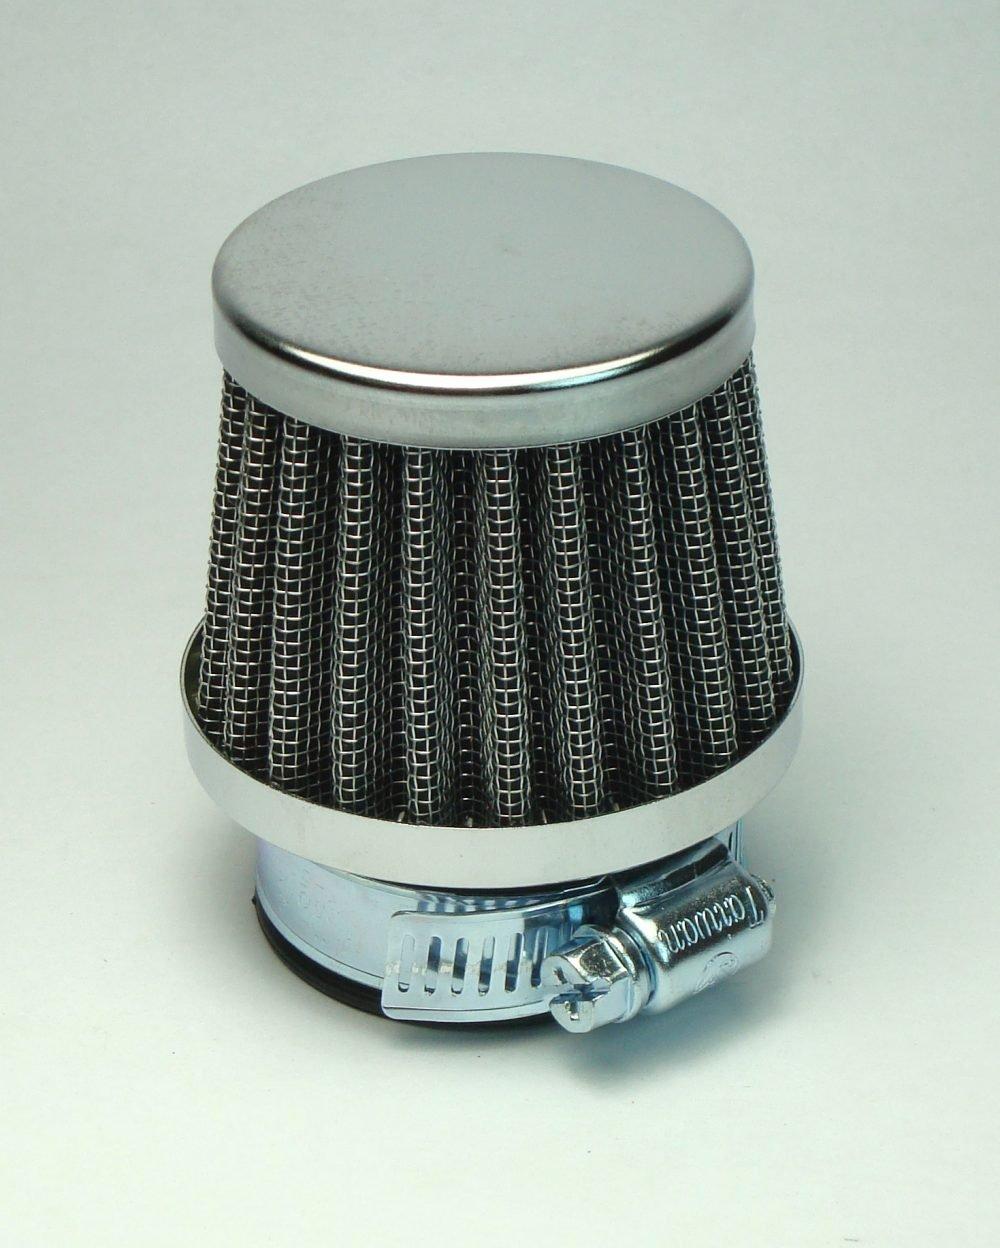 30 mm Rennsport Luftfilter Sportluftfilter Power Performance air filter 3,0 cm